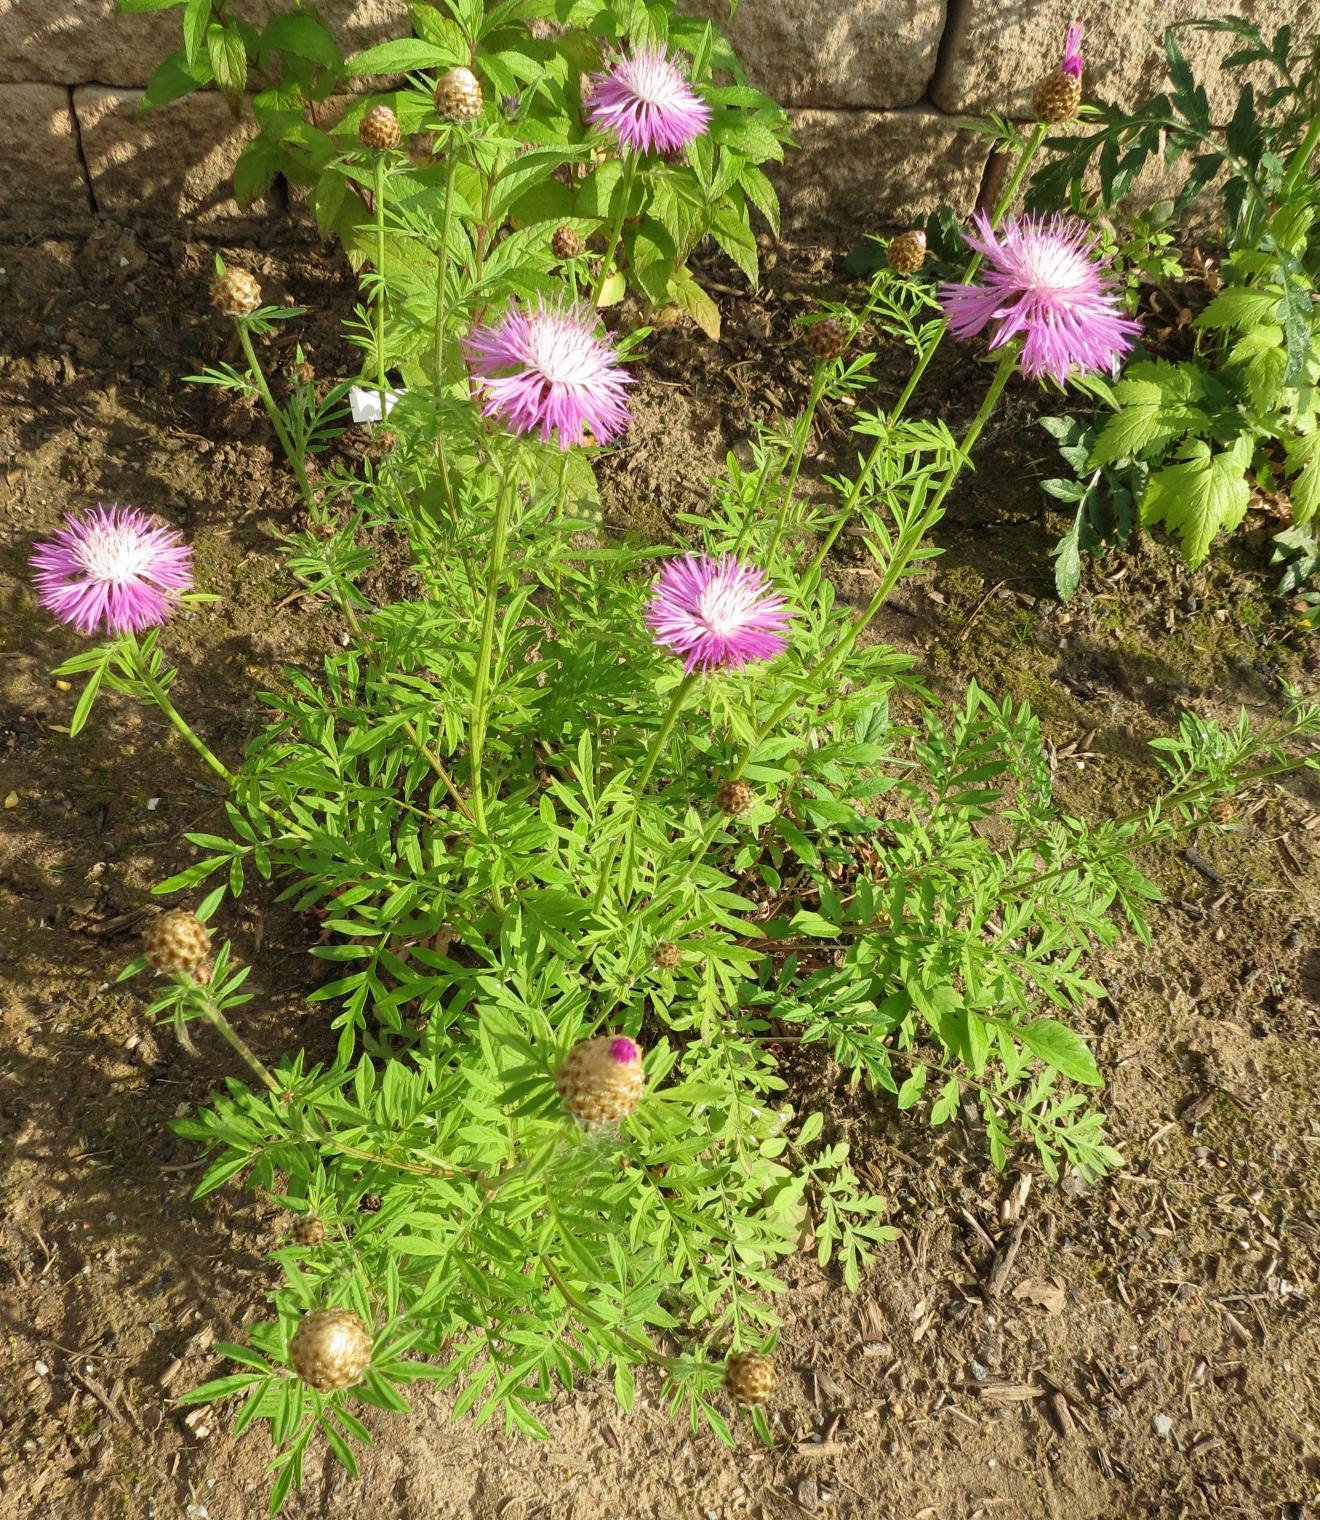 Kornblume - Centaurea dealbata 'Steenbergii' 8.6.(2)